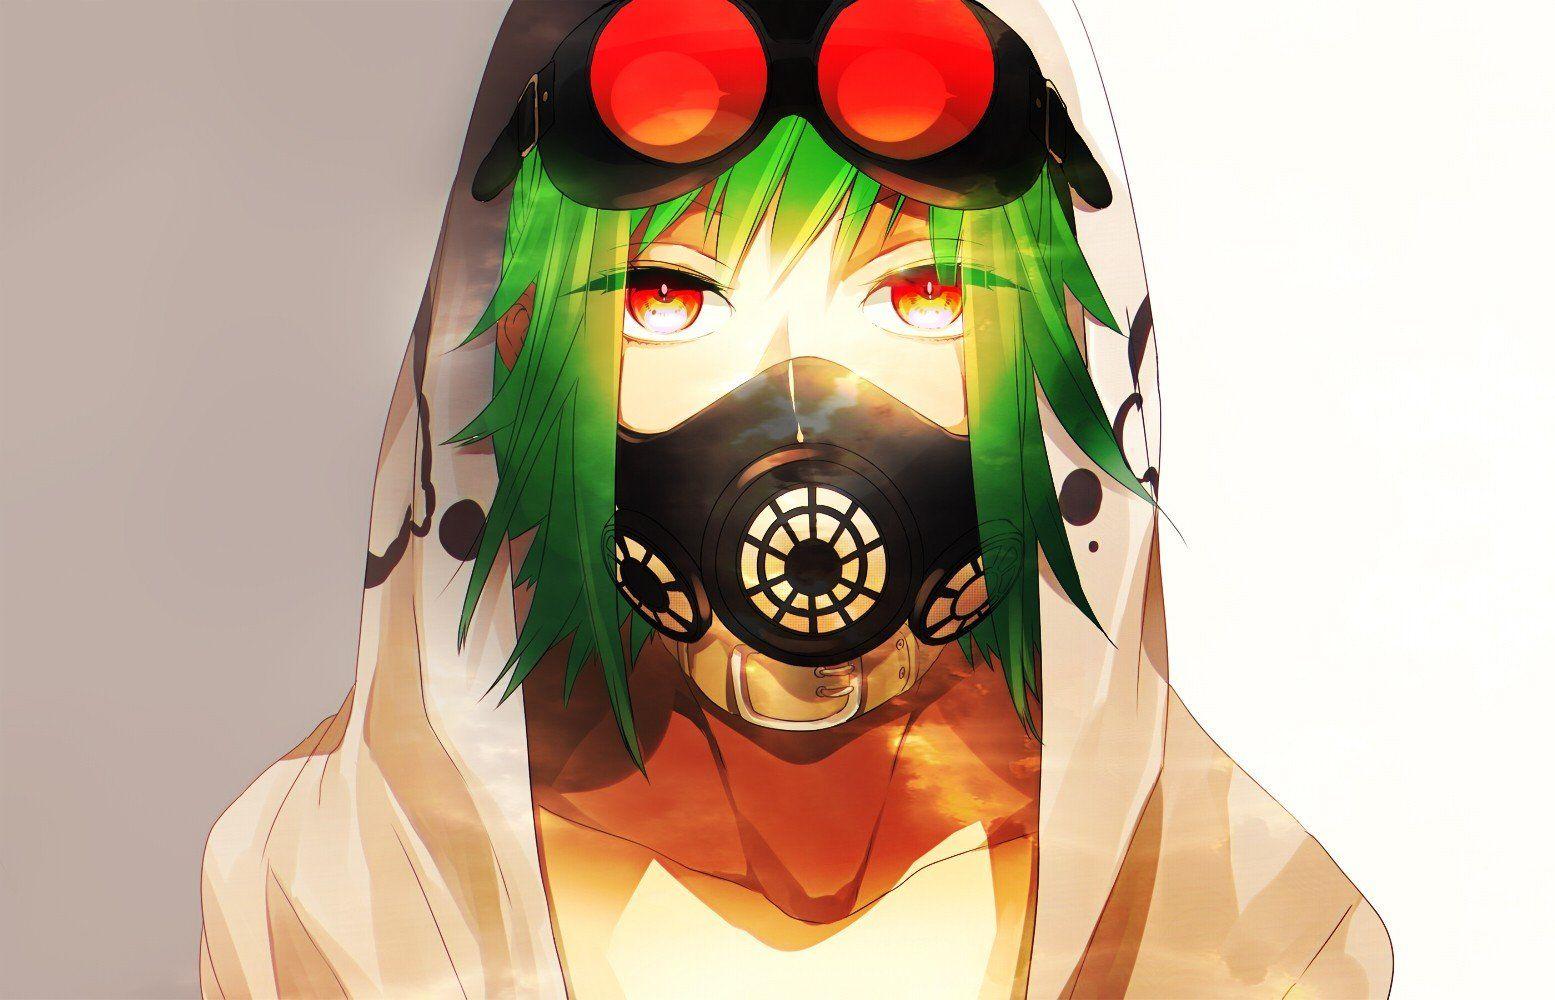 Anime Girls Gas Masks Goggles Green Hair Megpoid Gumi Red Eyes